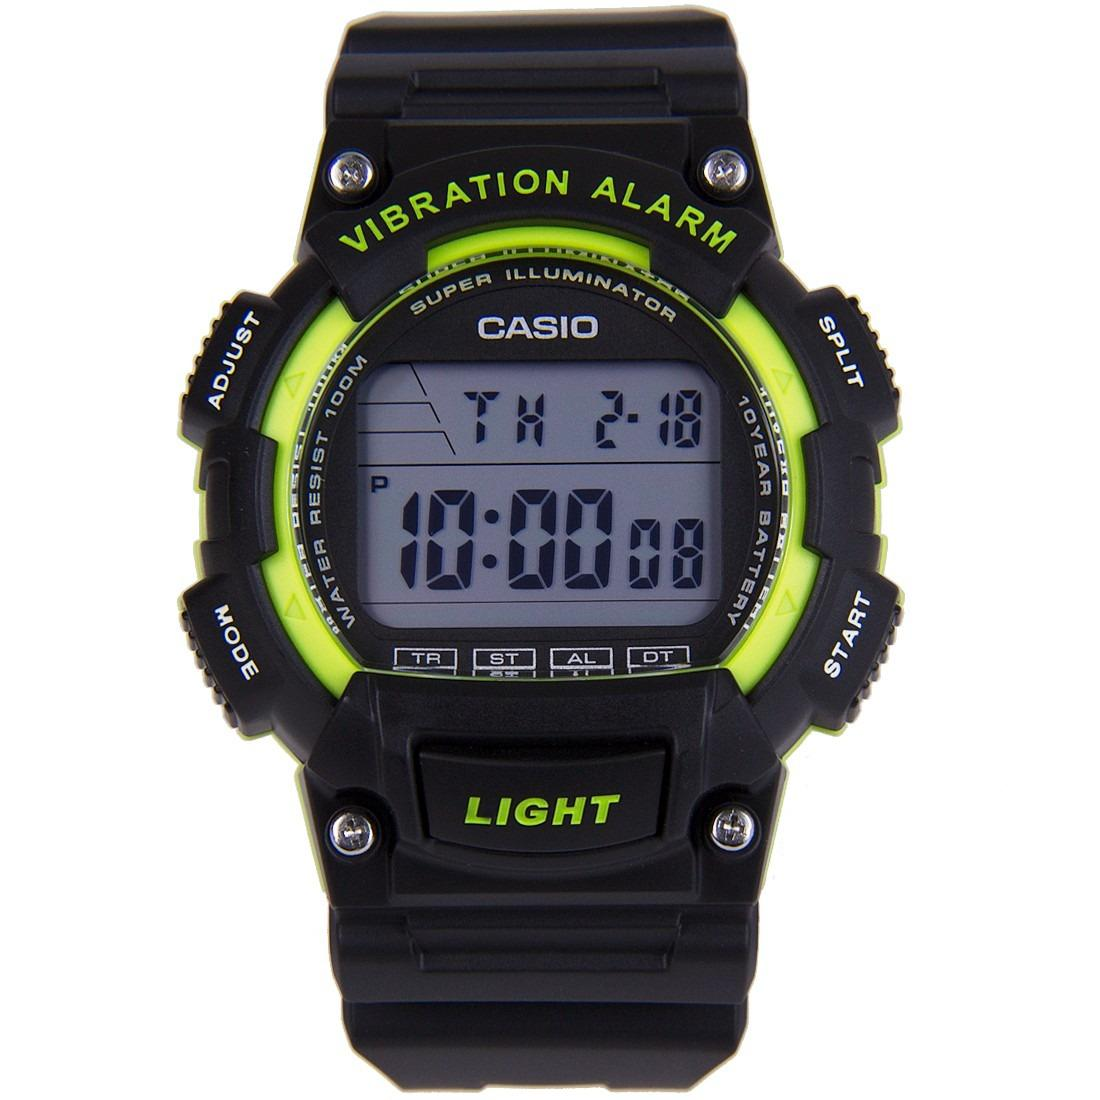 Price Compare Casio Super Illuminator Vibration Alarm Dual Time Digital Men S Black Resin Strap Watch W 736H 3Av